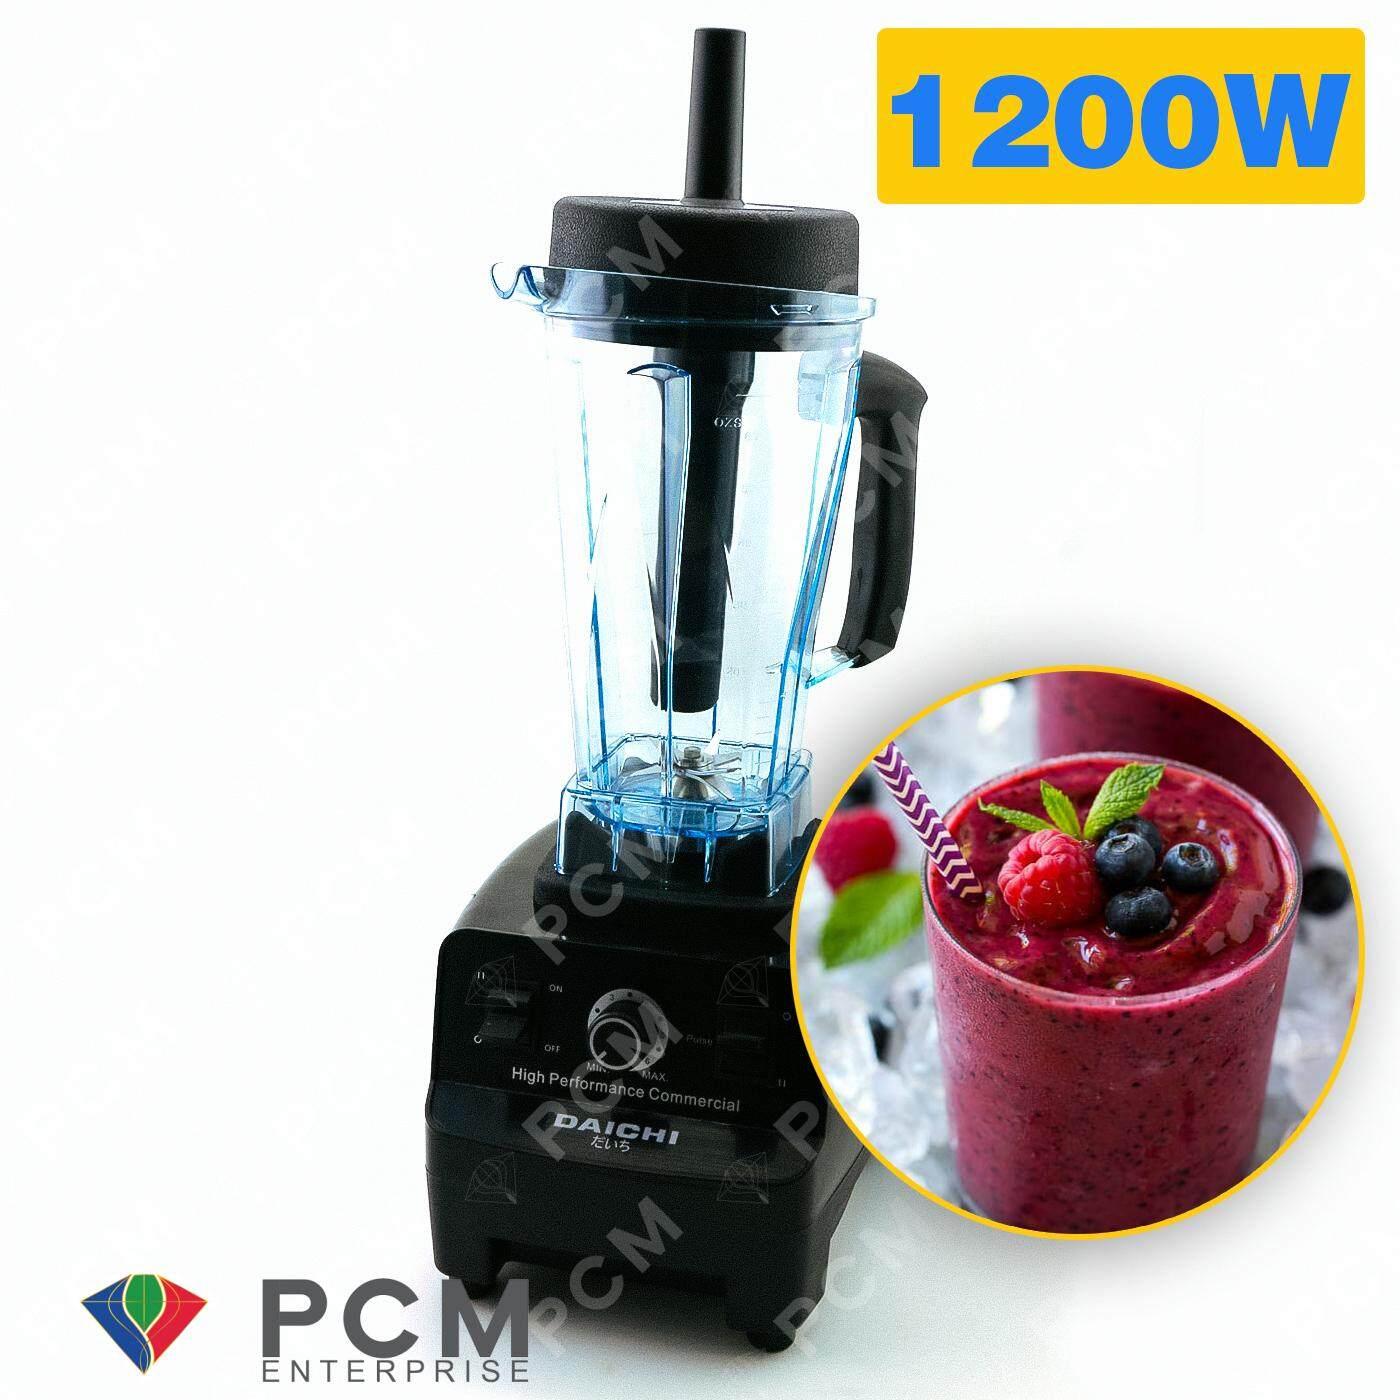 Daichi [PCM] เครื่องปั่น สมูทตี้ น้ำผลไม้ Smart Blender รุ่น DSM-130 กำลัง 1200W